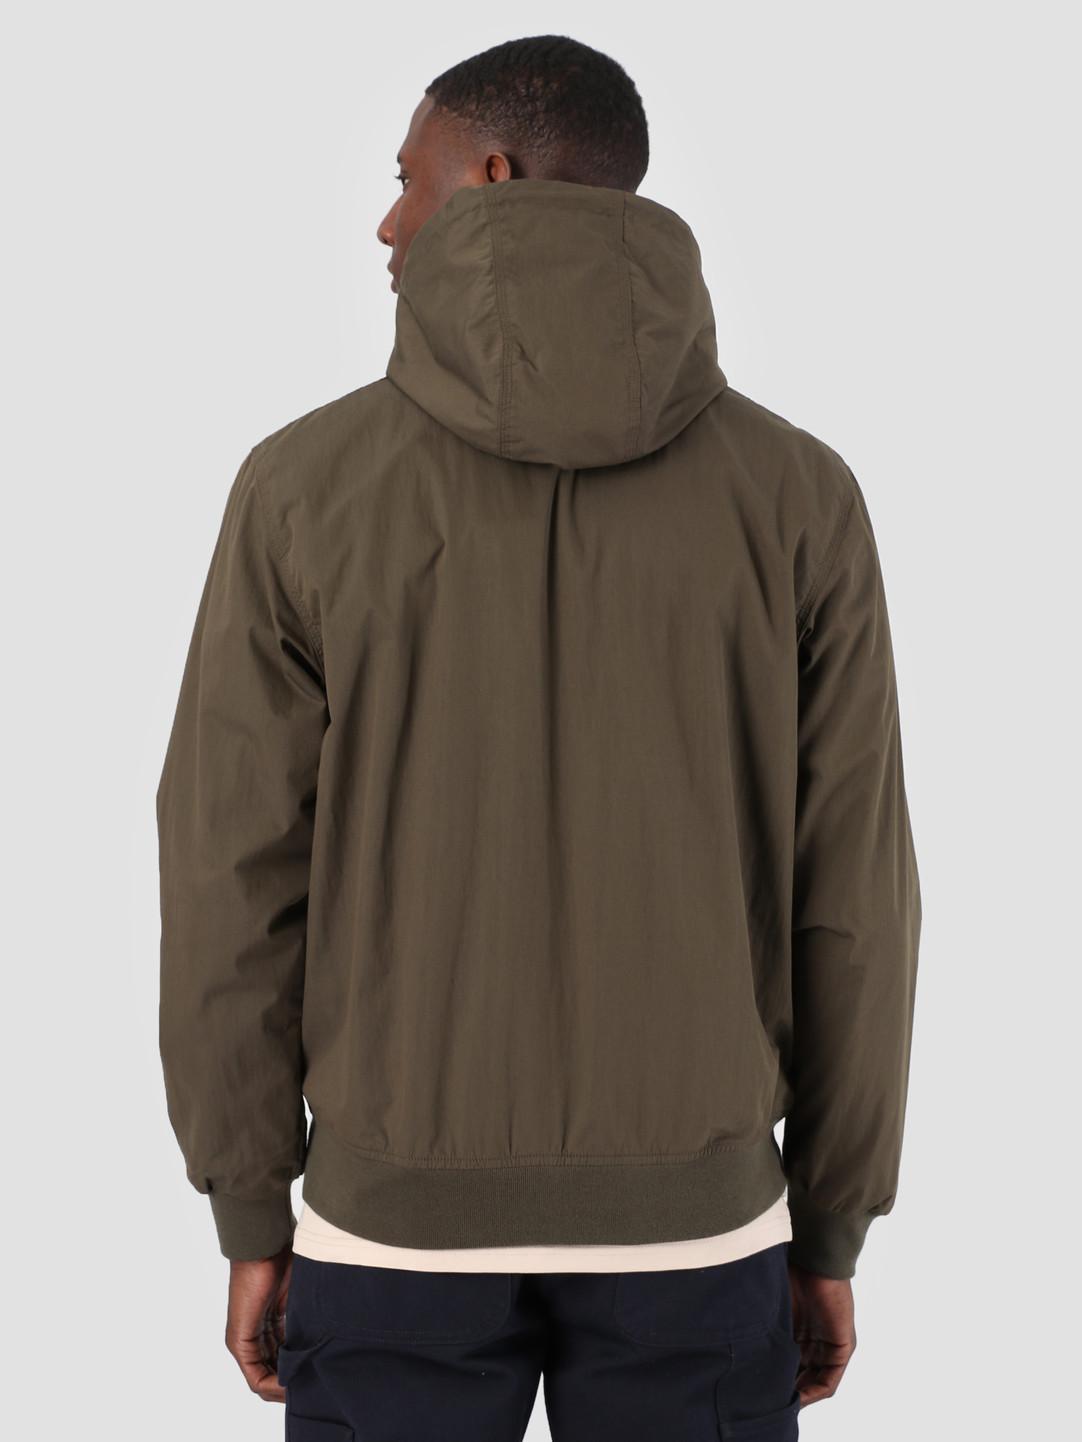 Carhartt WIP Carhartt WIP Marsh Jacket Cypress White I025756